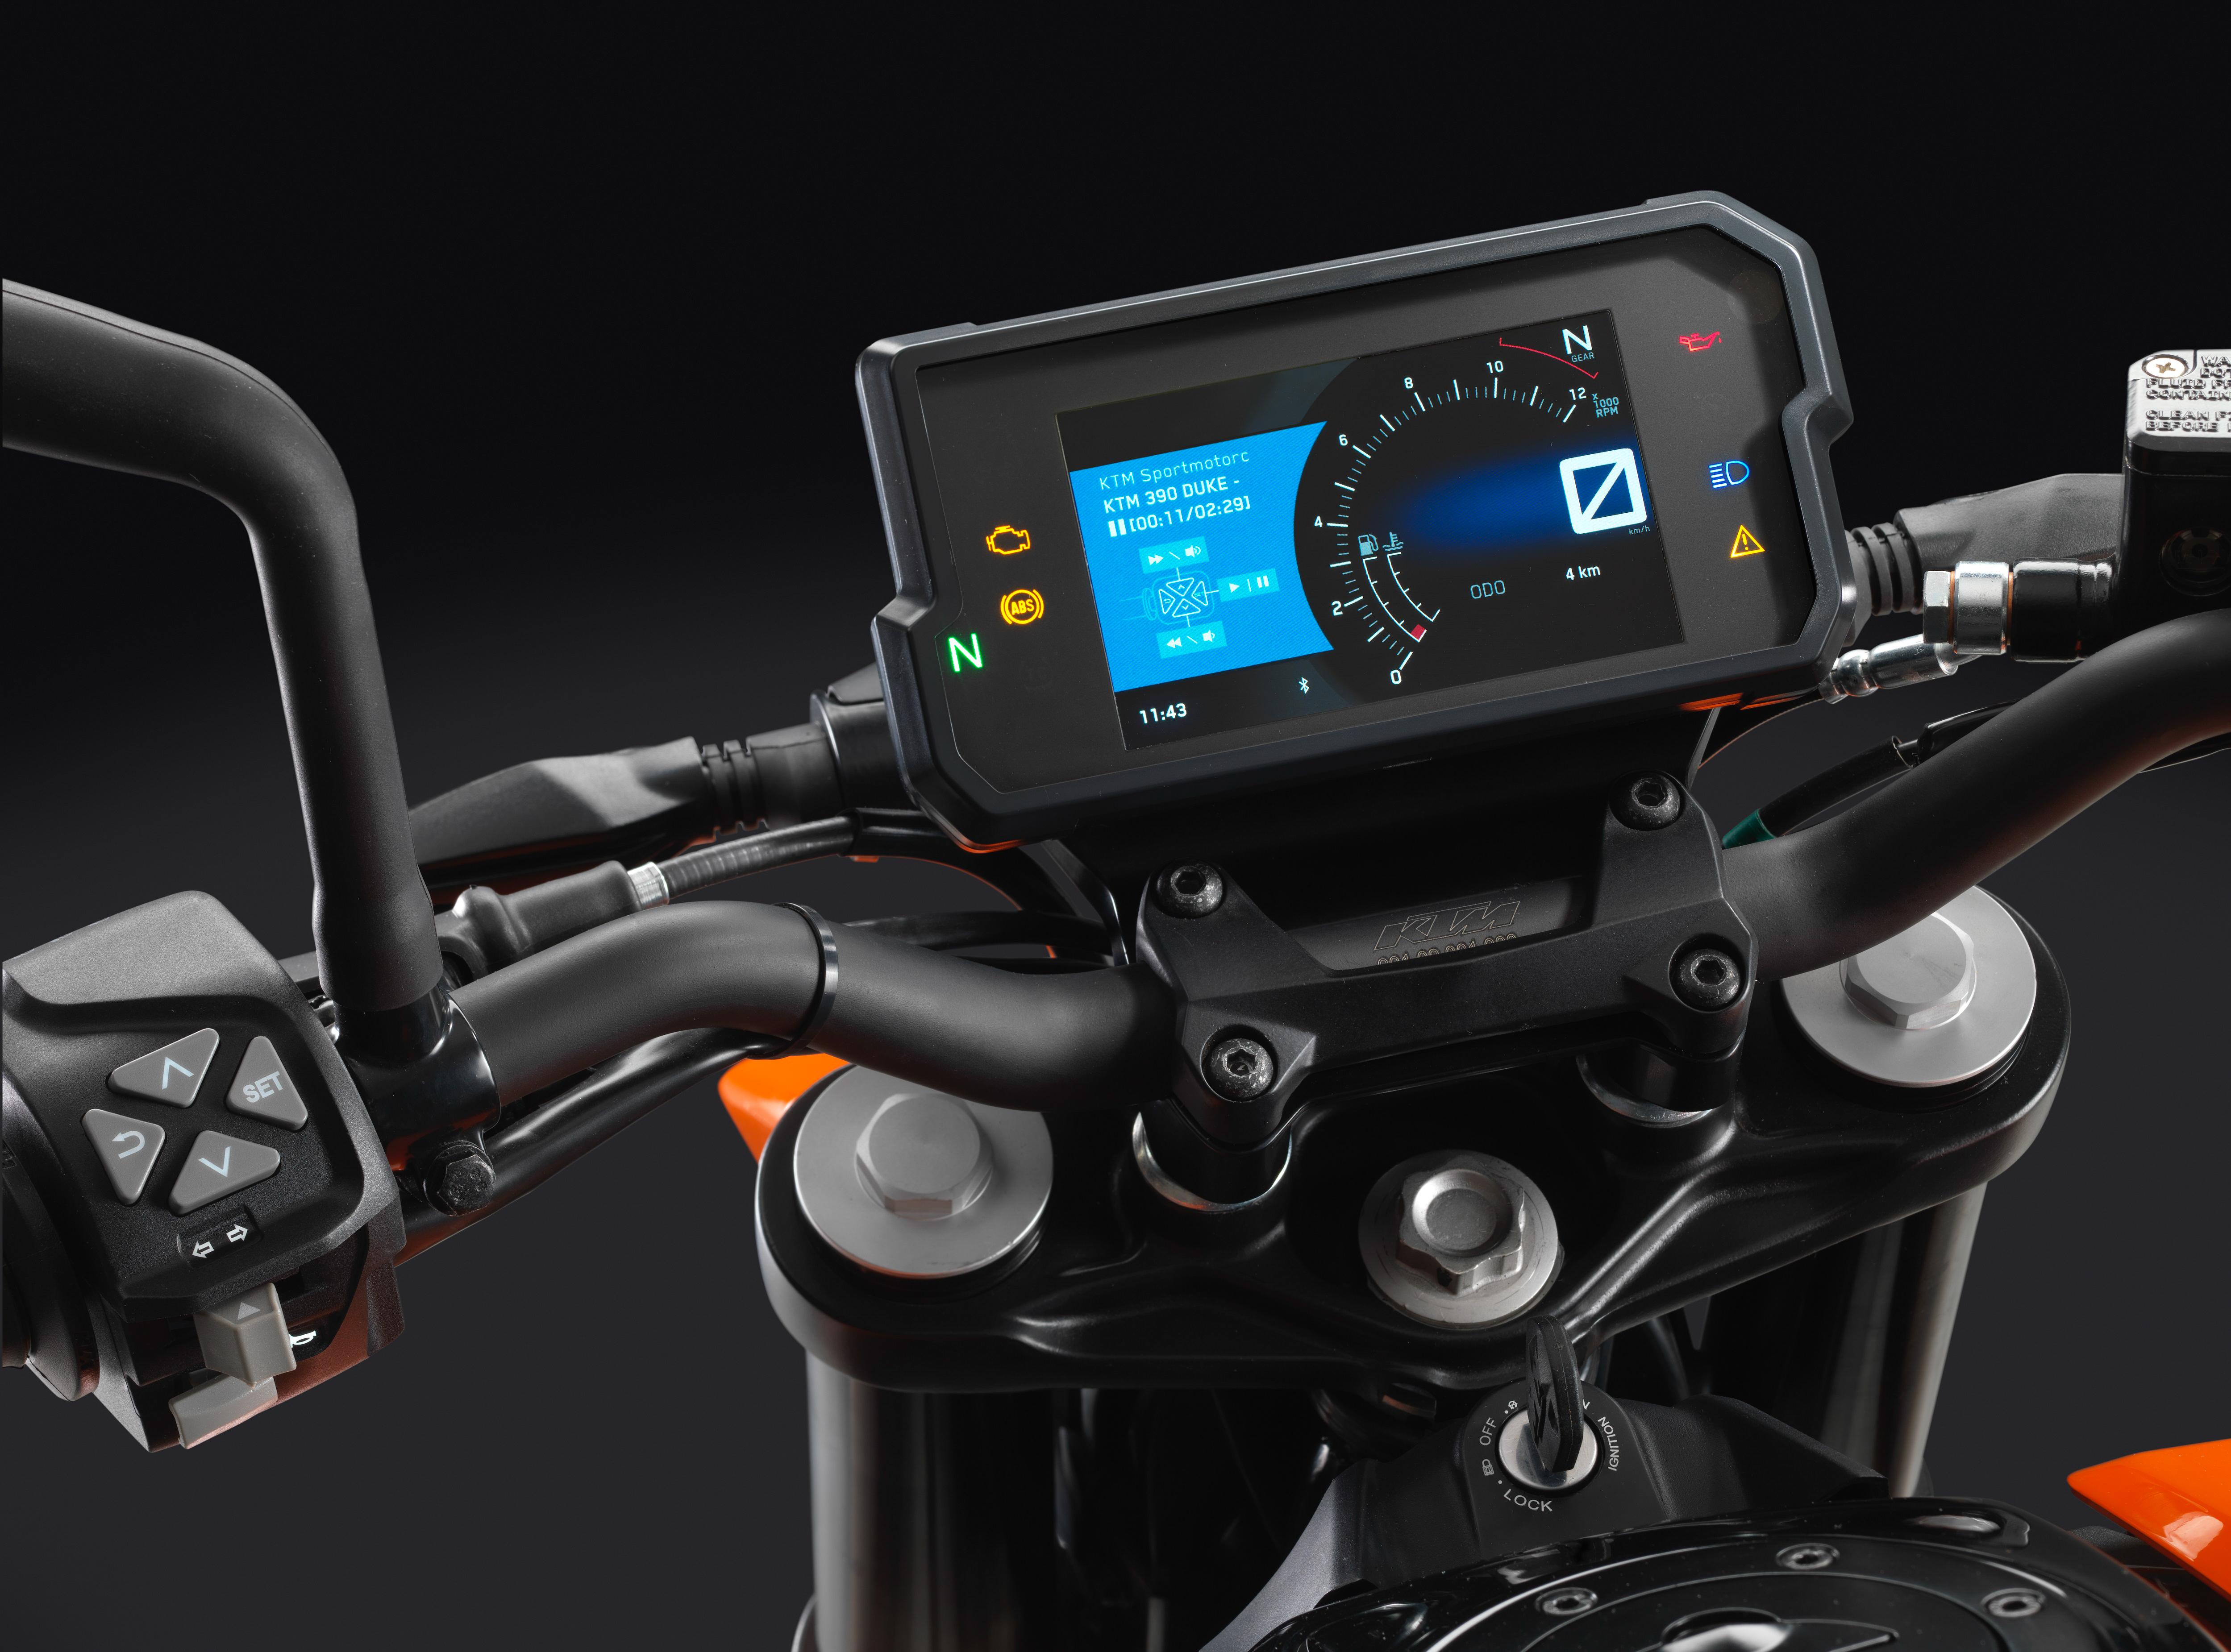 2017 KTM 390 Duke first ride review - RevZilla